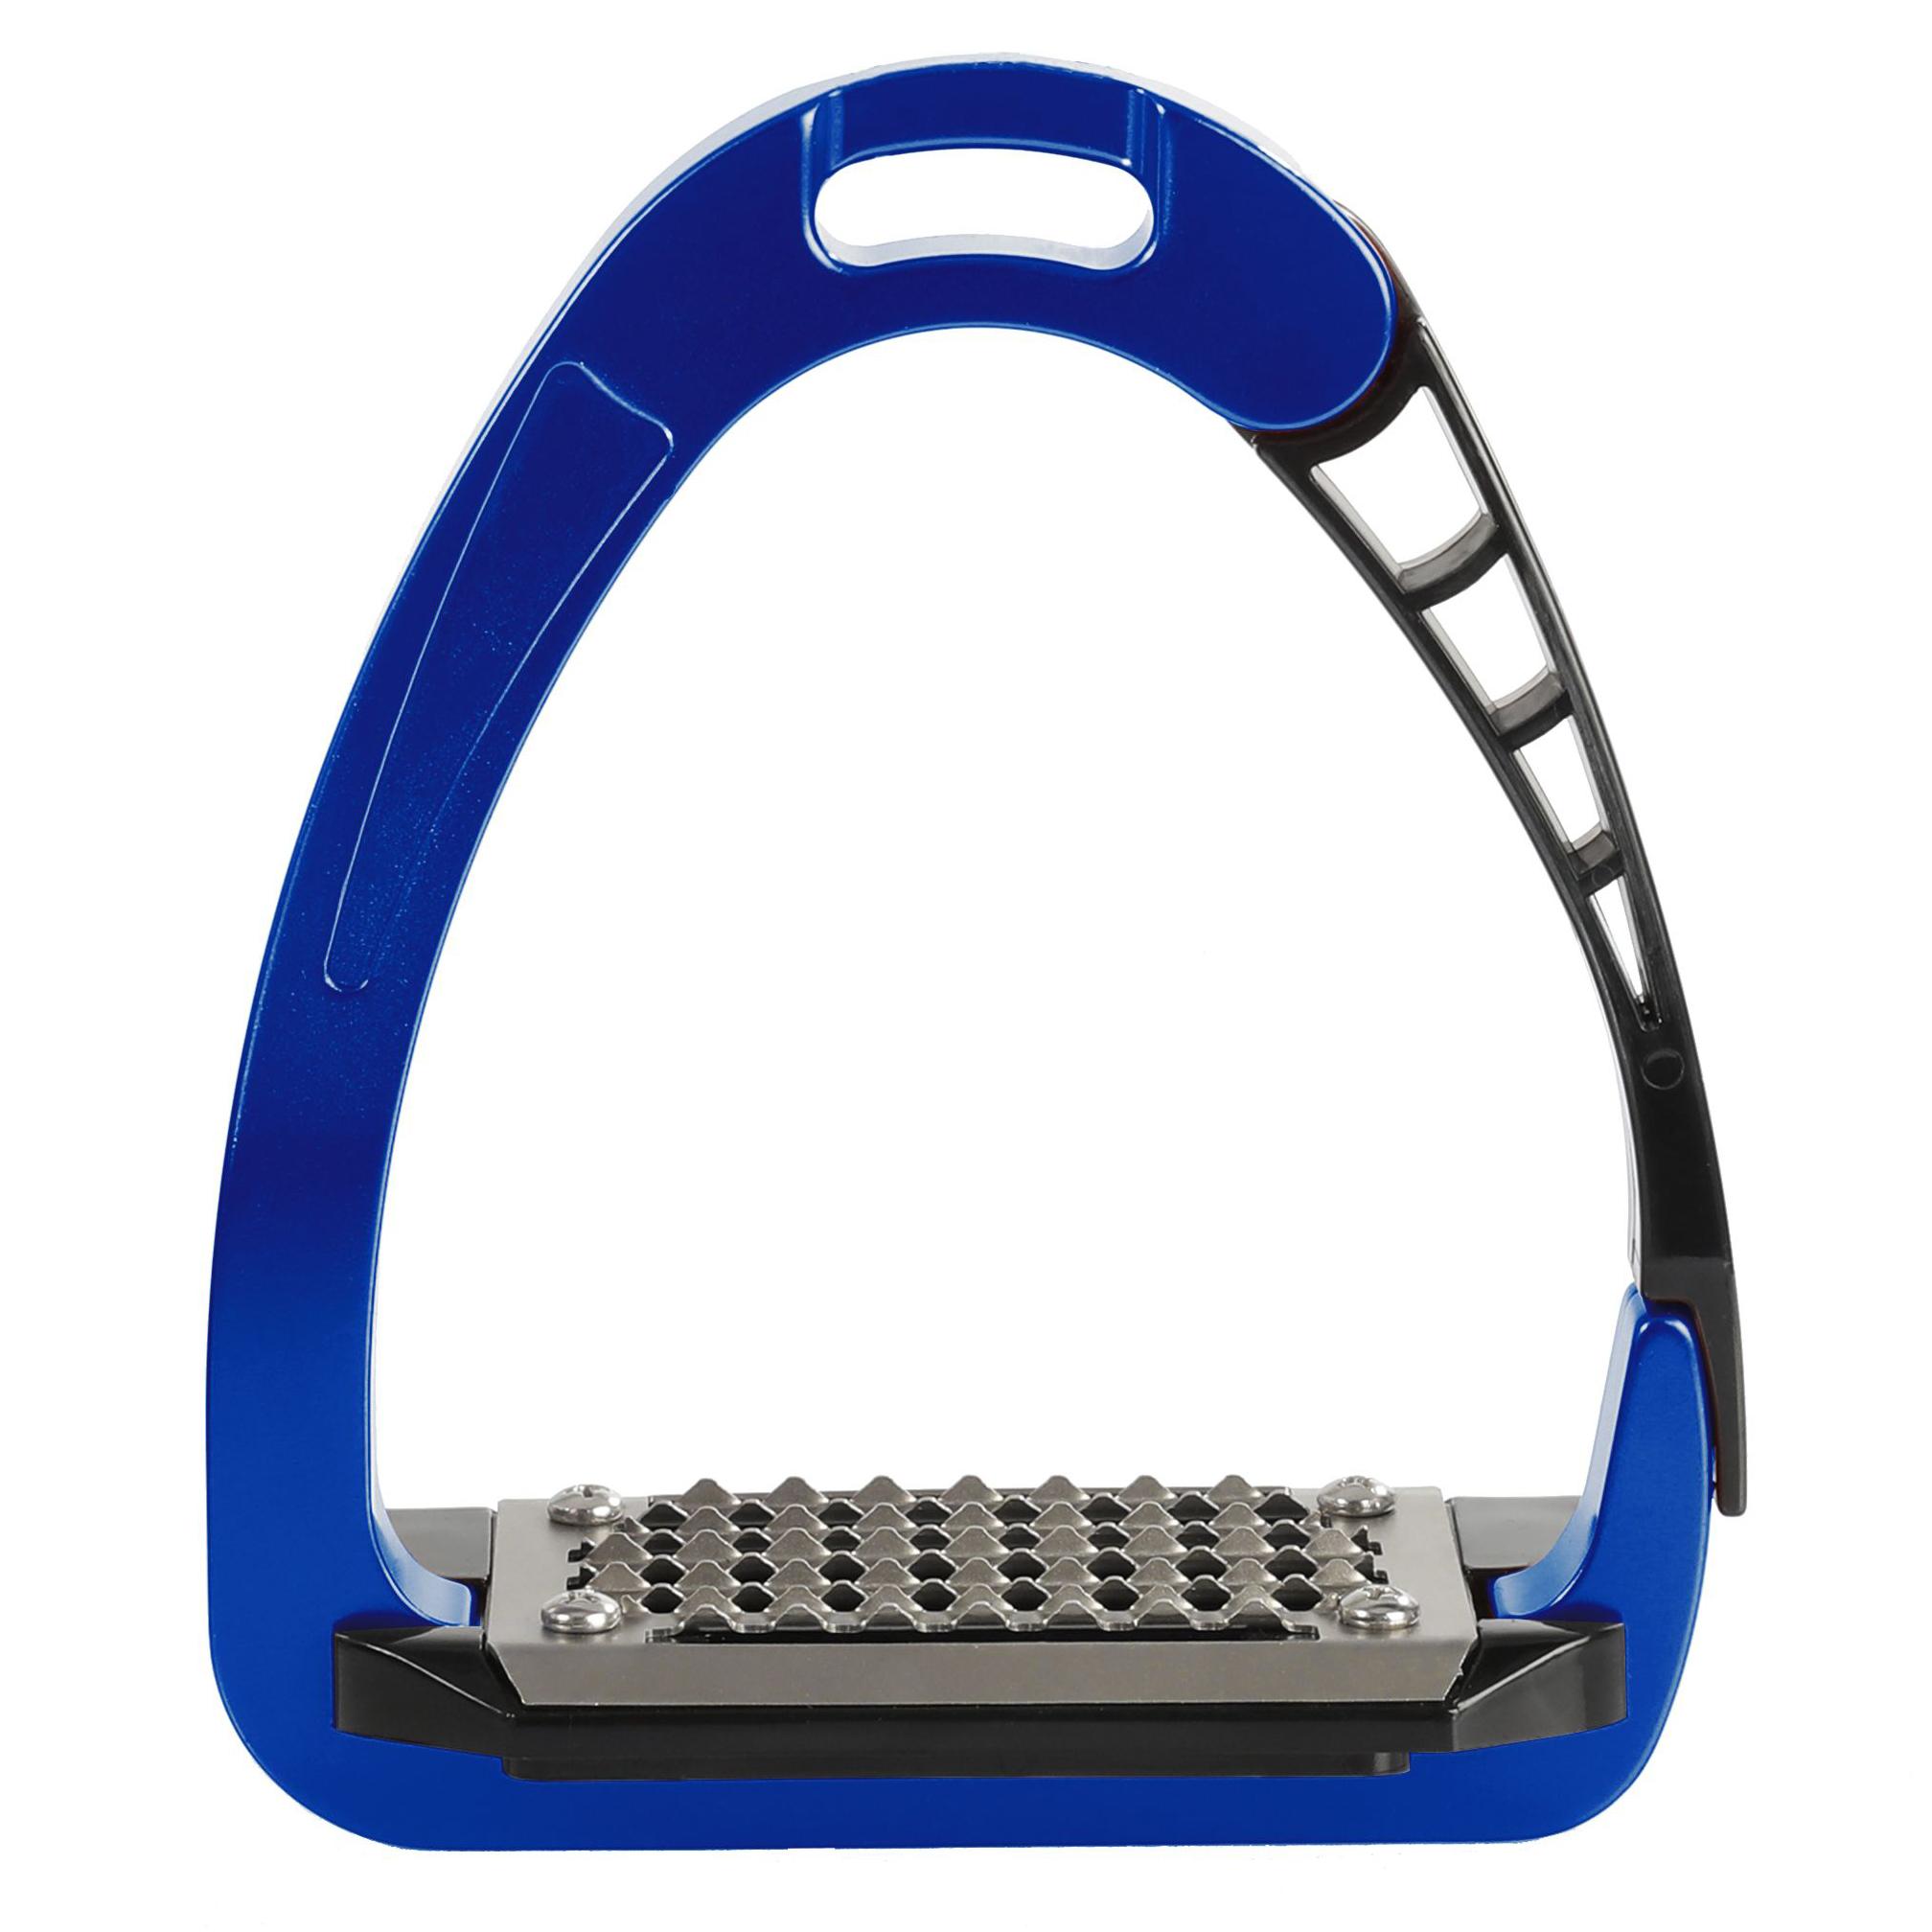 ACAVALLO - Sicherheits-Steigbügel Arena Alupro, Farbe blue